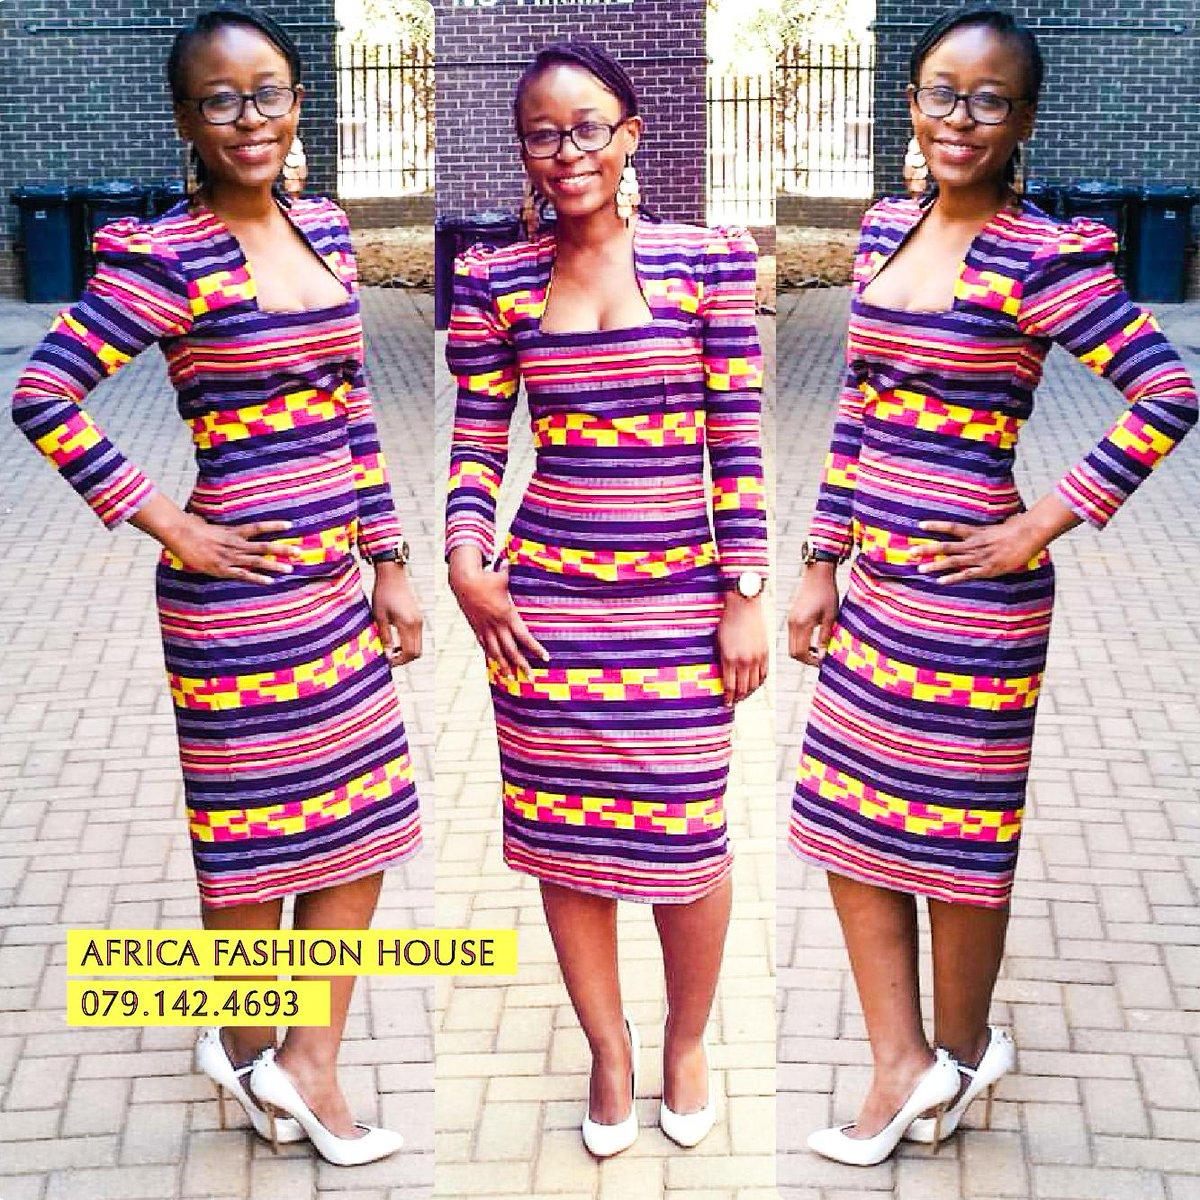 162 best Africa Fashion House images on Pinterest | Africa fashion ...